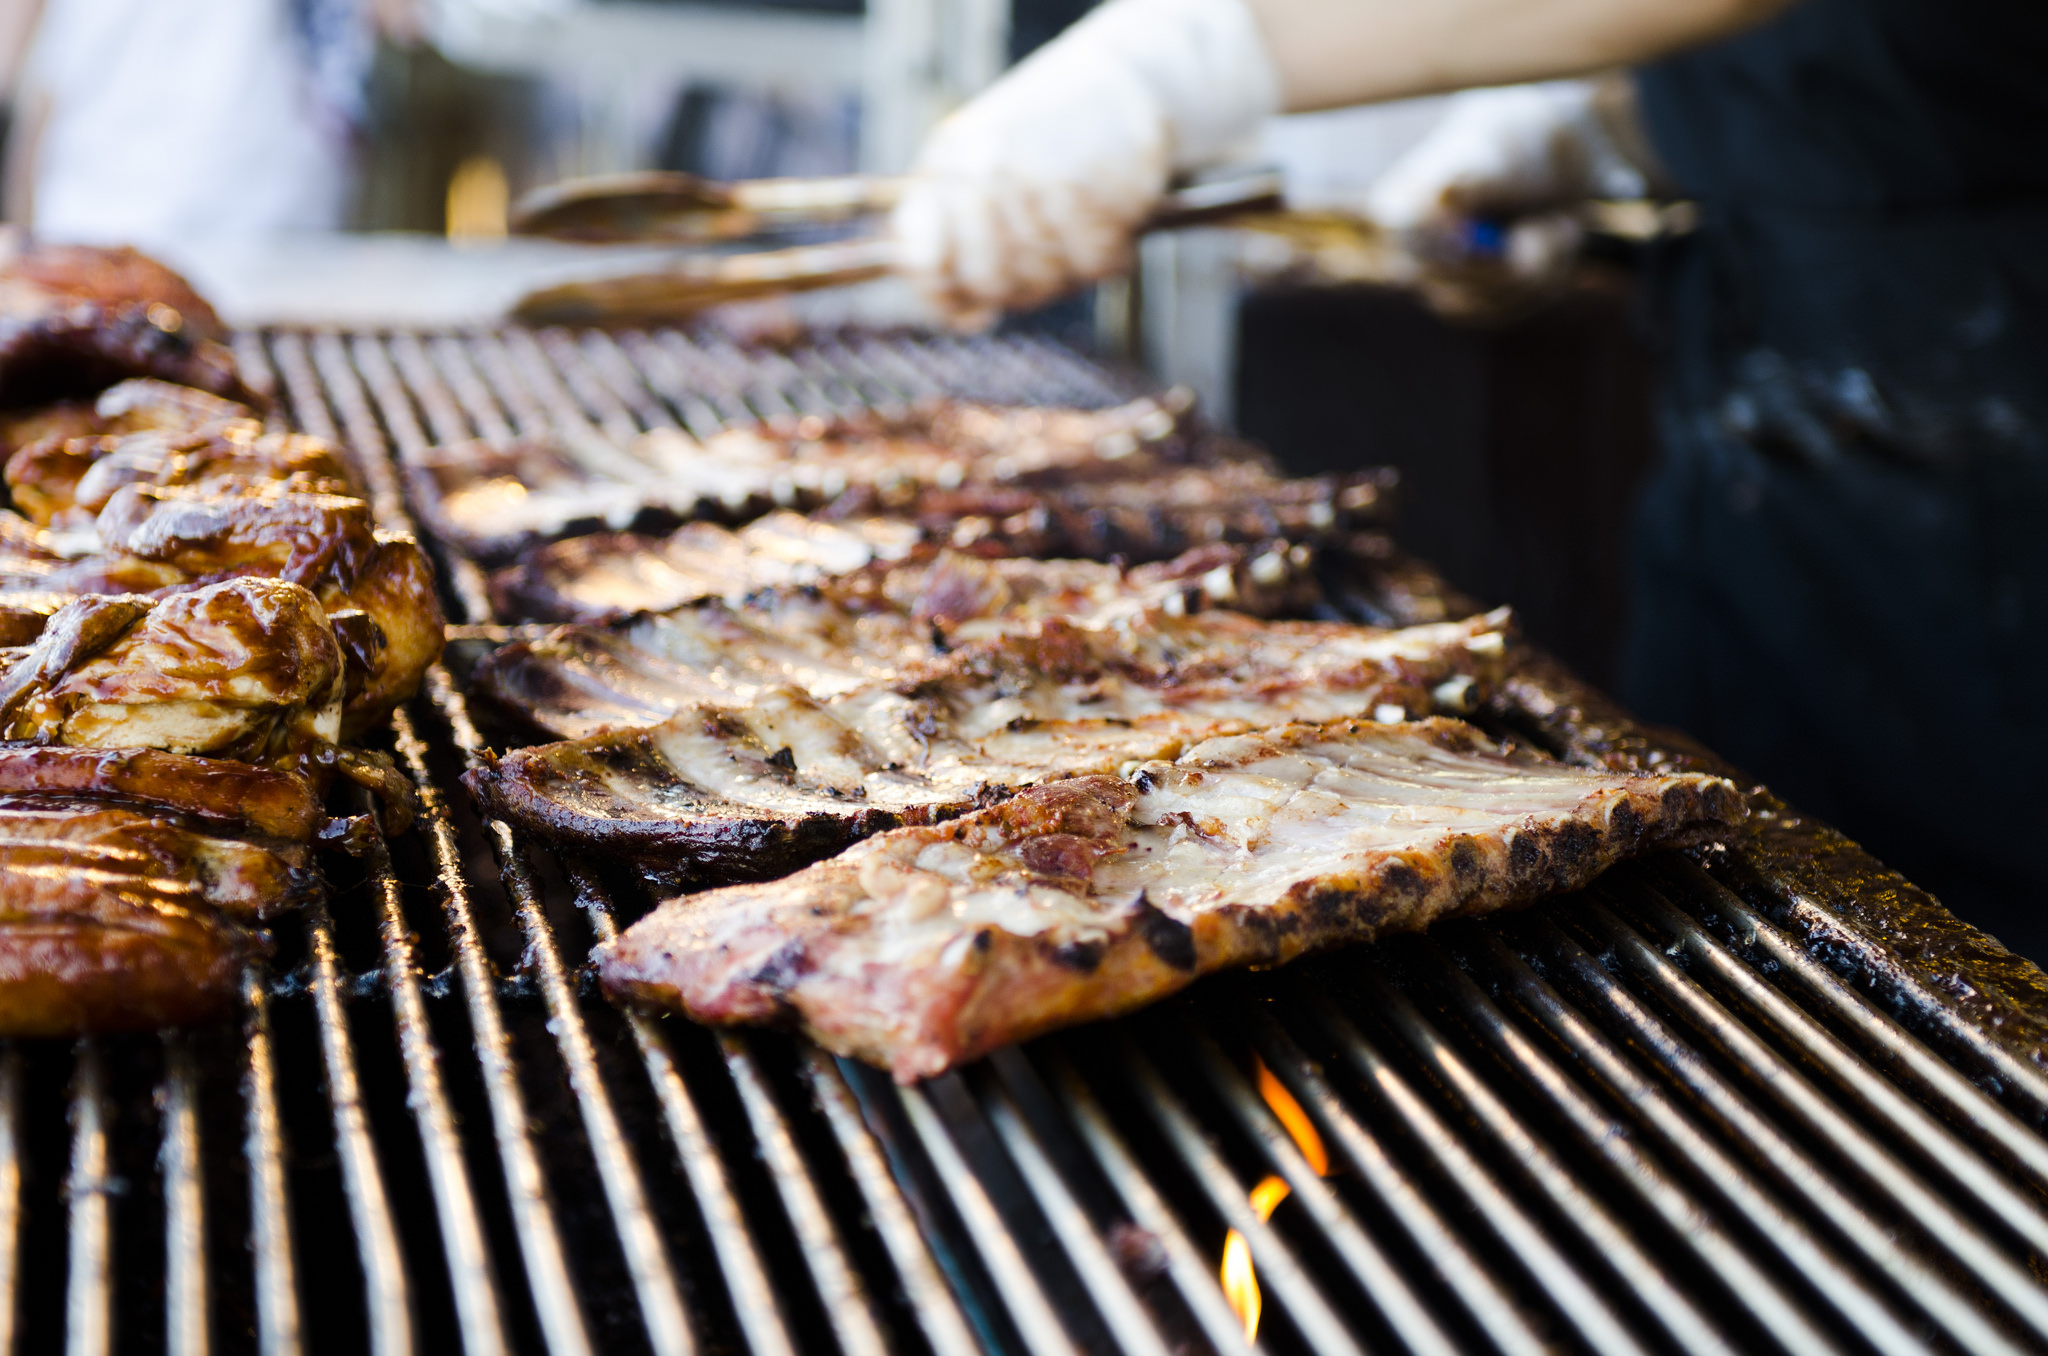 Meat Cravings, Ribs  © Boris Kasimov/Flickr